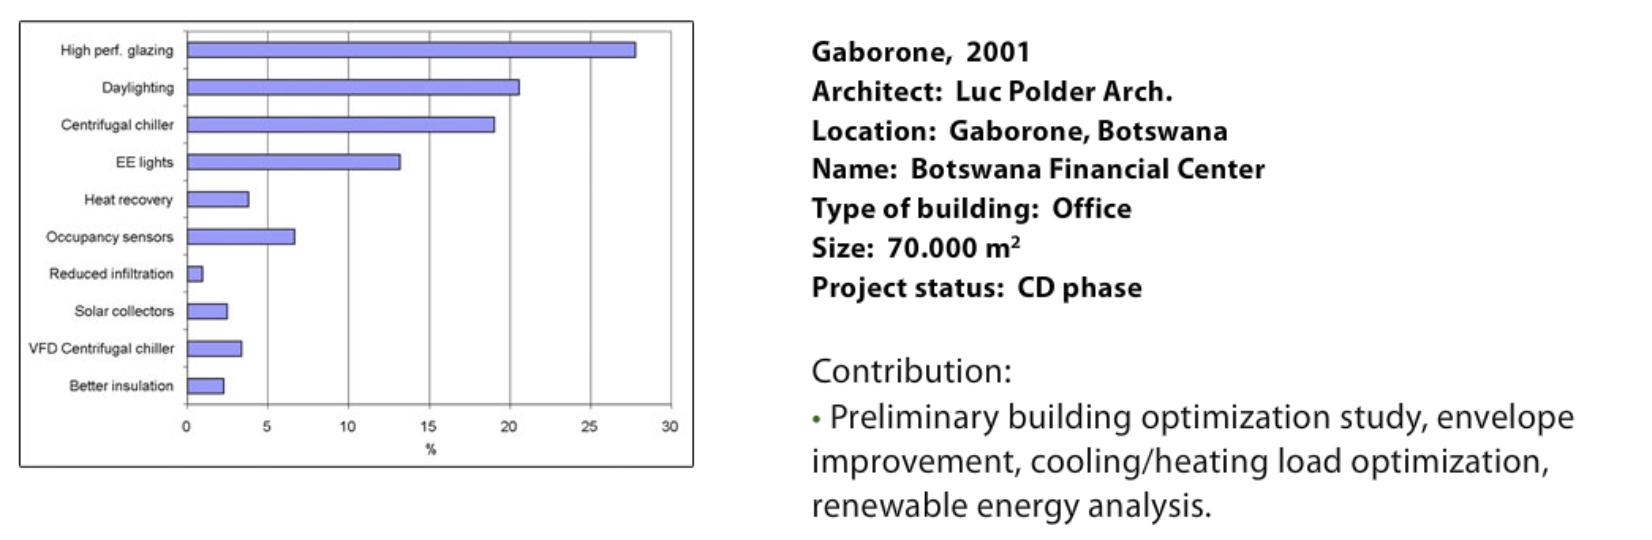 Gaborone 2001